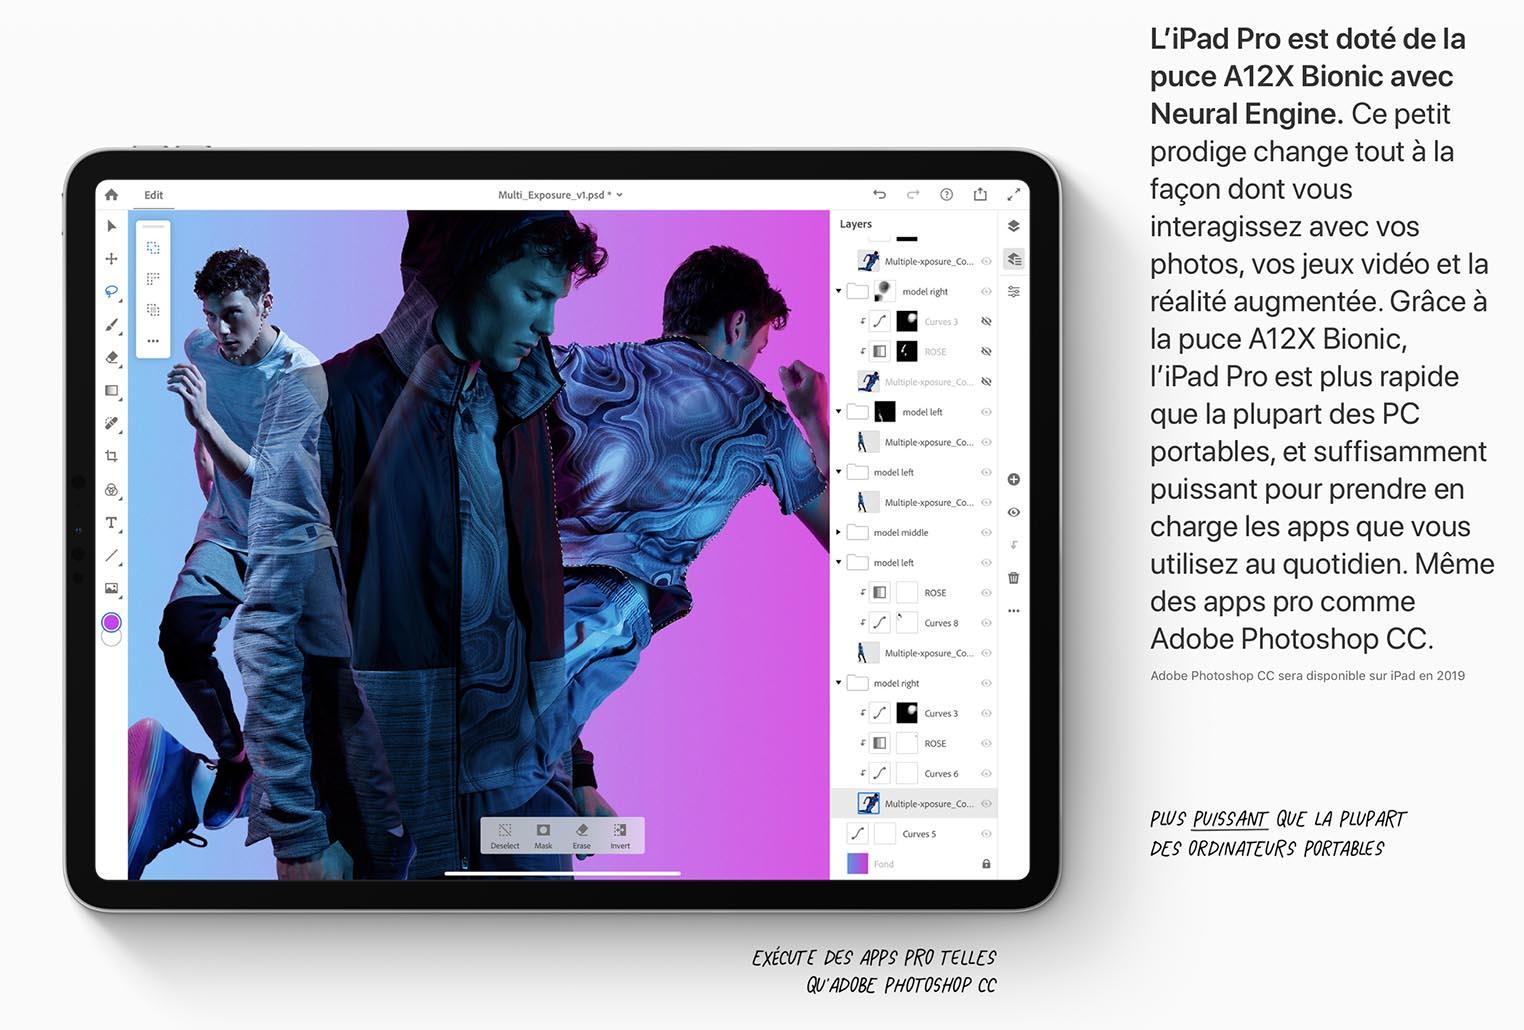 iPad Pro 2018 puissance